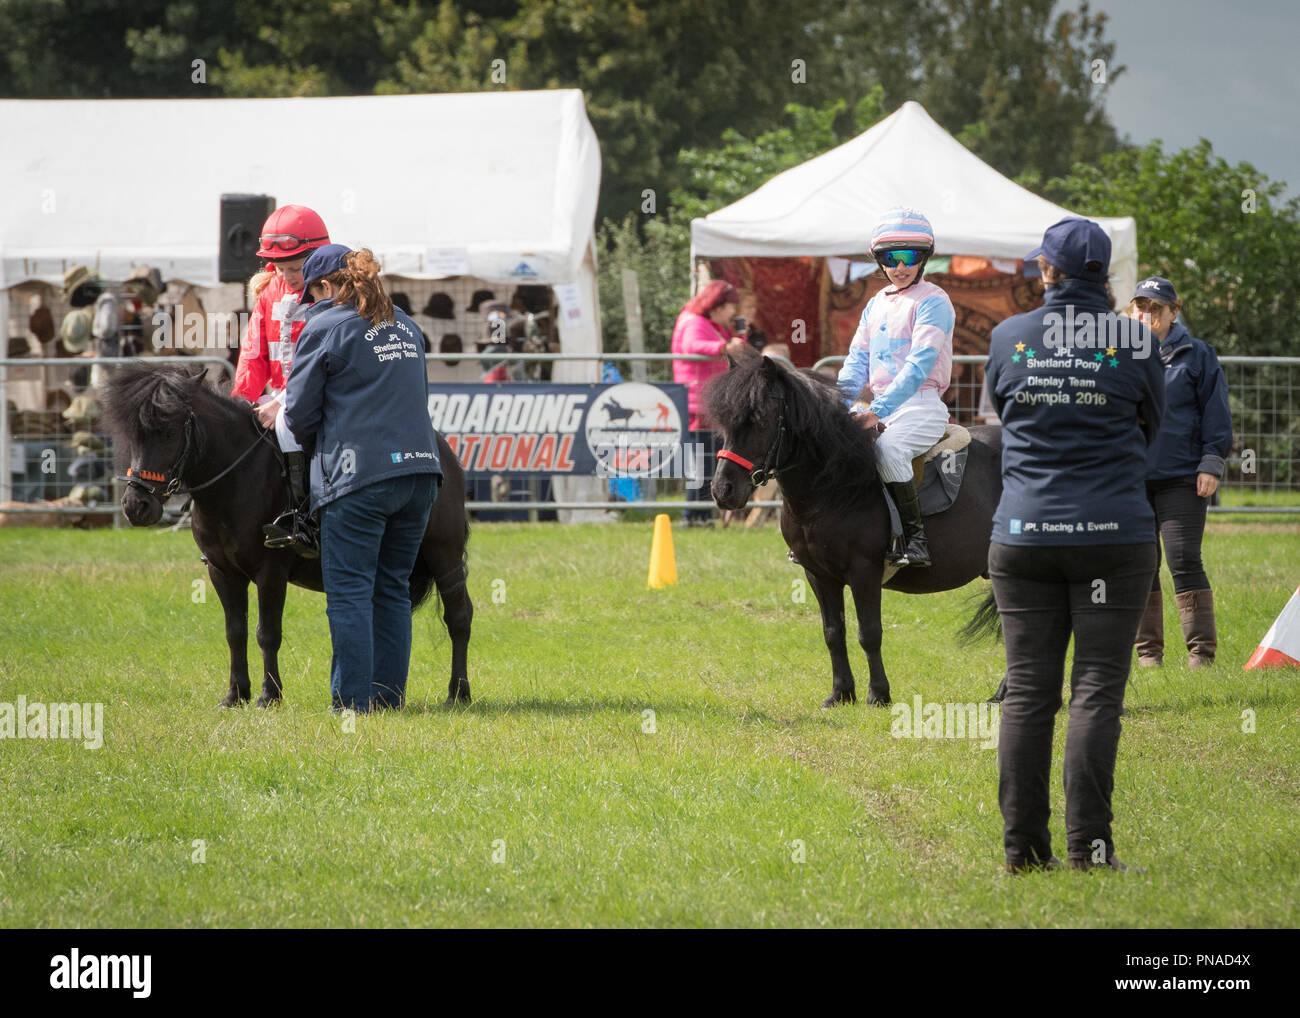 Cheshire Country Fair 2018 - Shetland Pony Racing - Stock Image